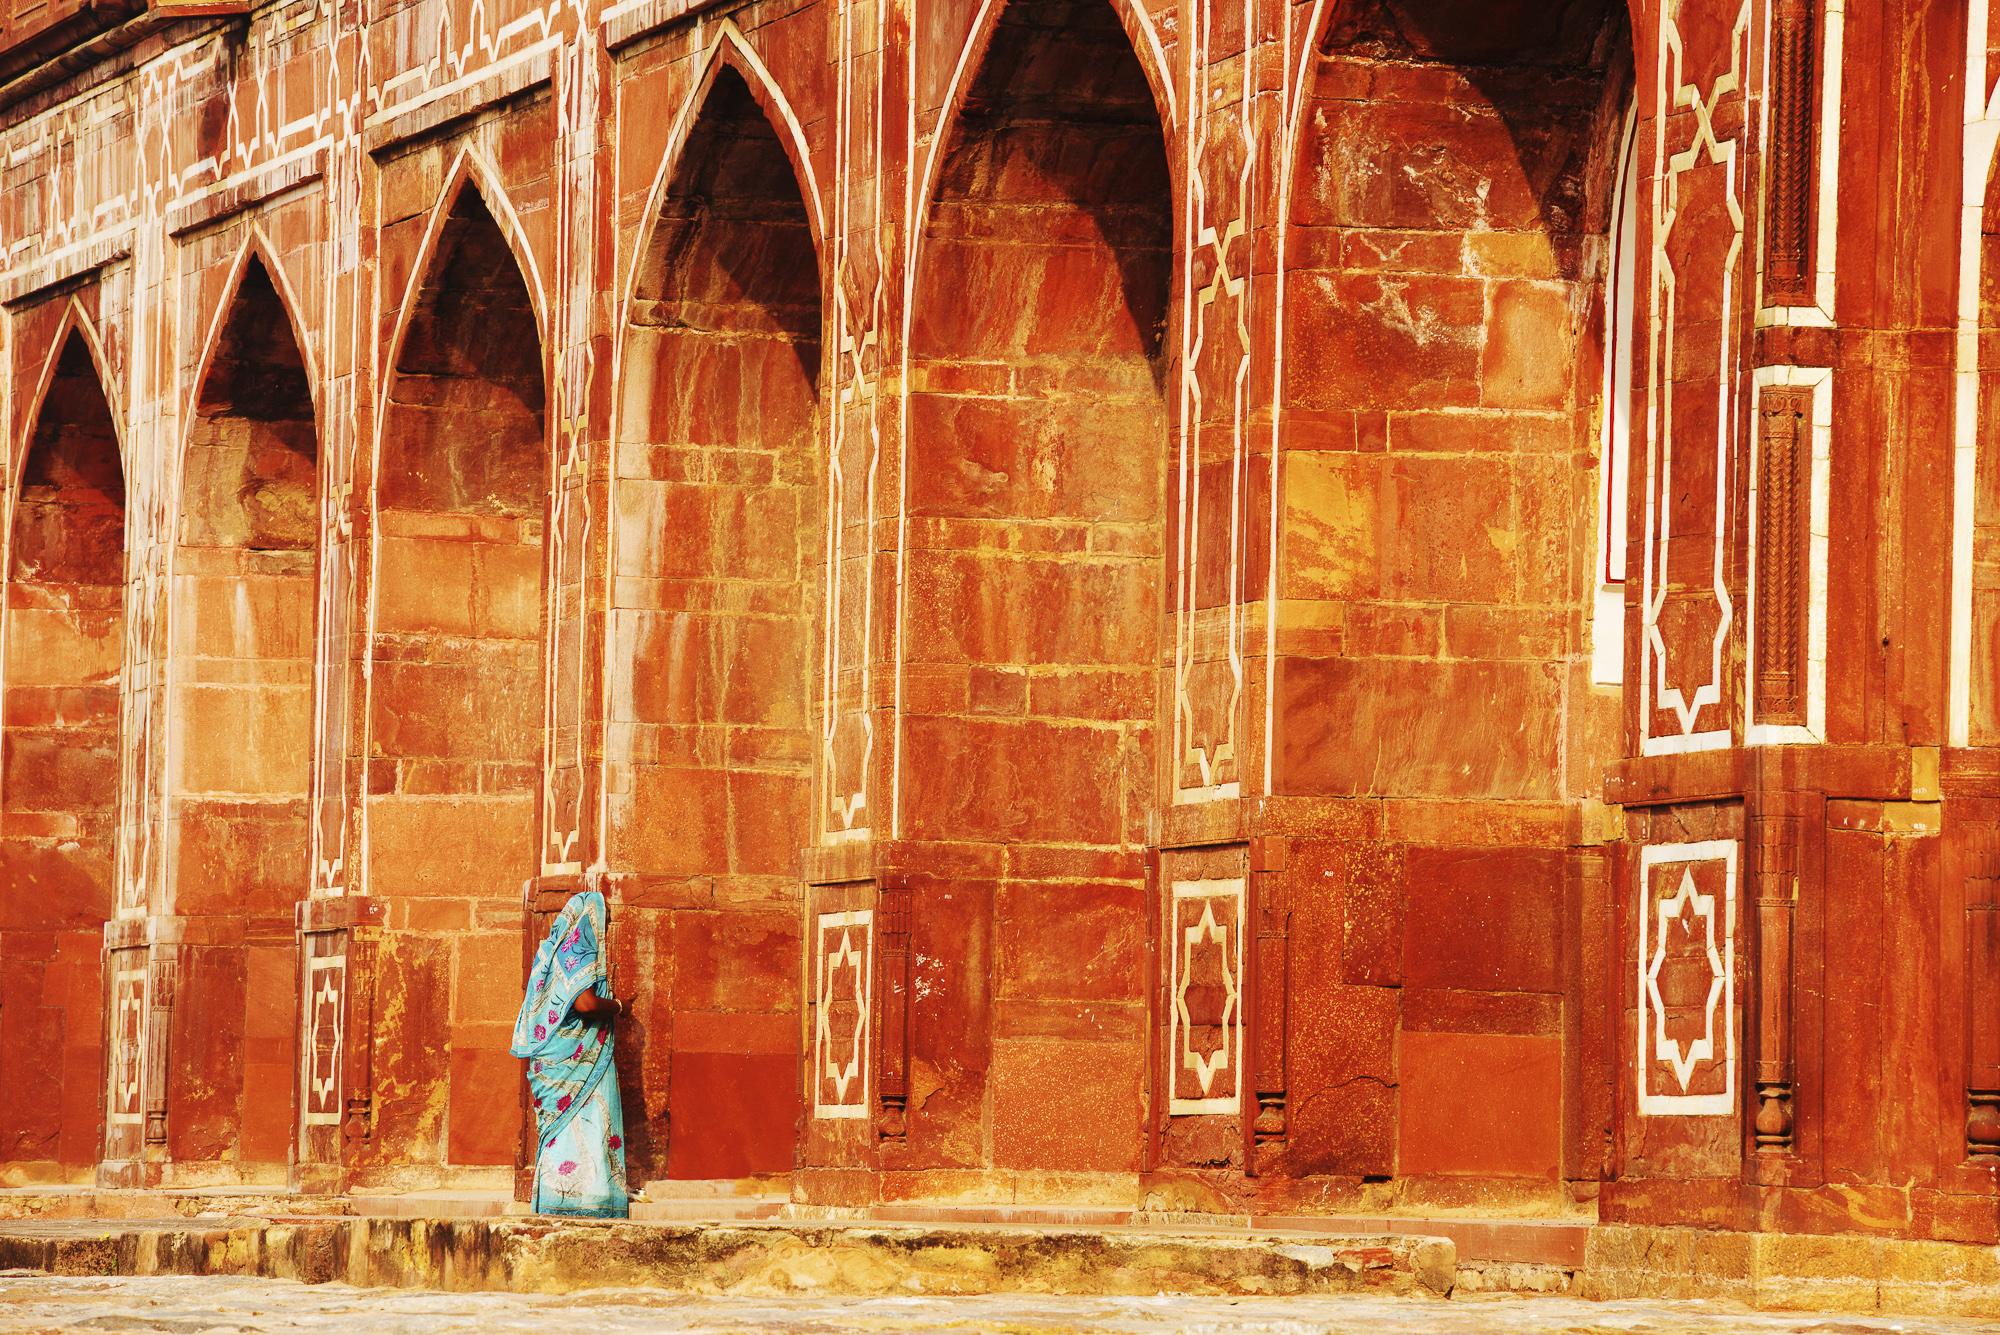 Woman & Arches of Humayun's Tomb, New Delhi, India